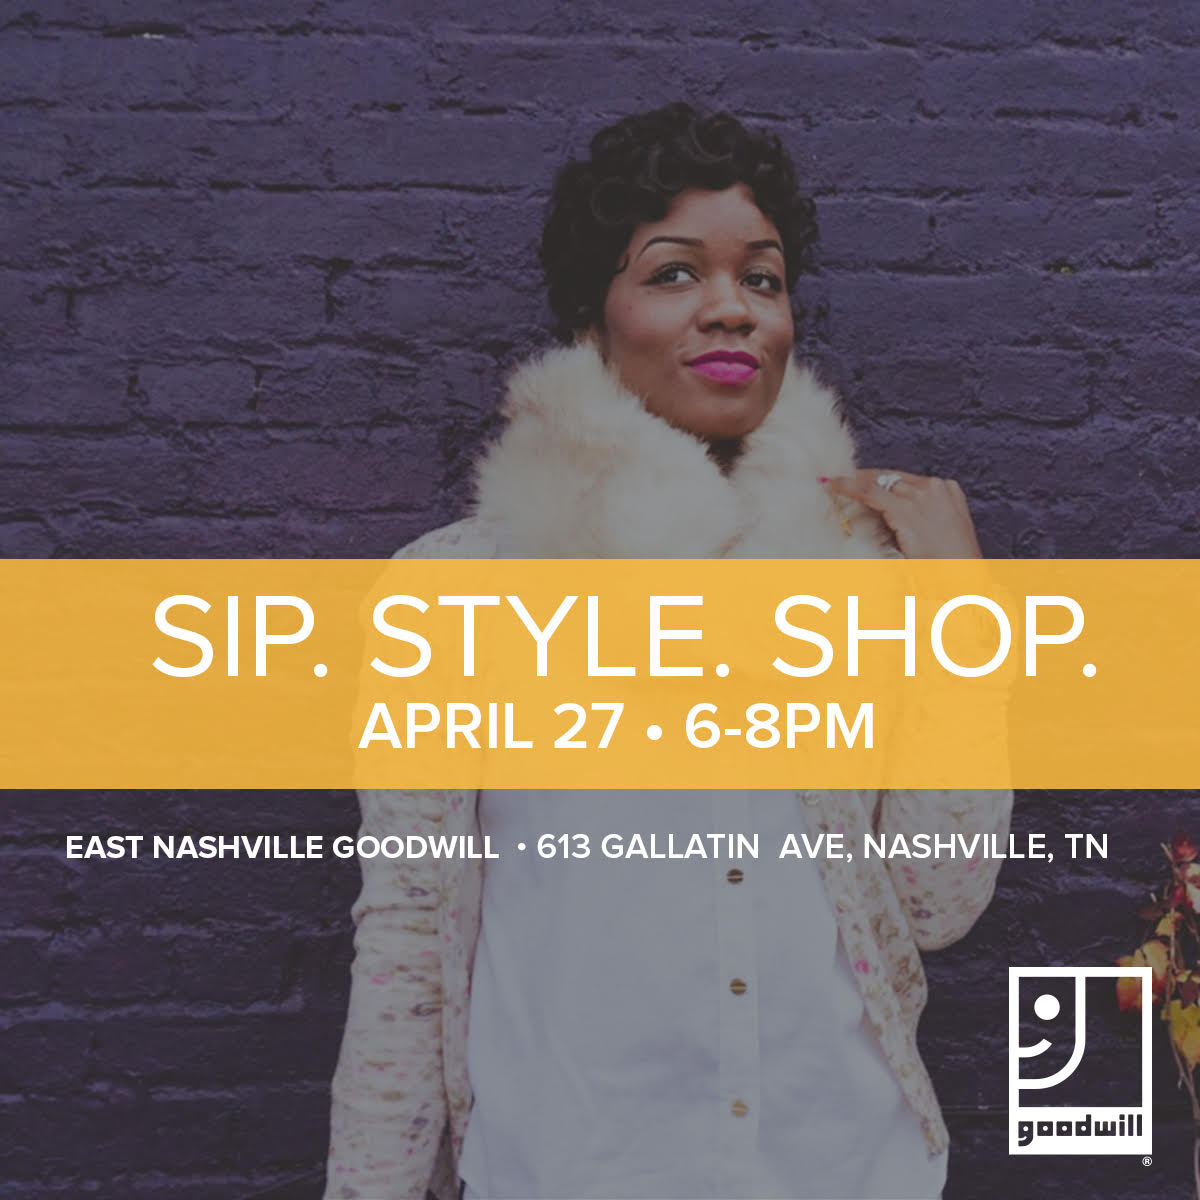 Sip.Style.Shop Image.jpg